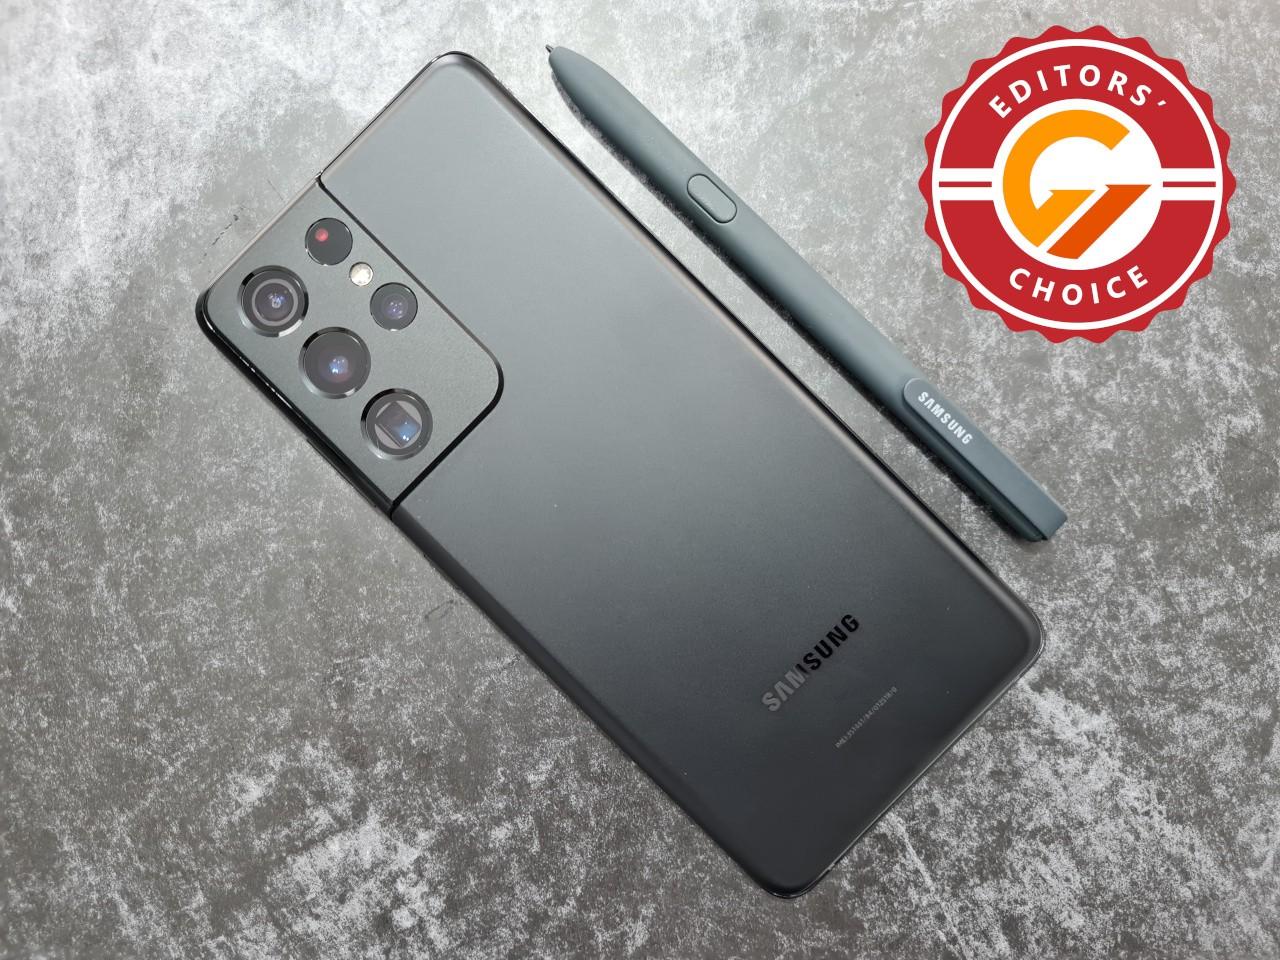 Samsung Galaxy S21 Ultra - Gadgetren Editors Choice